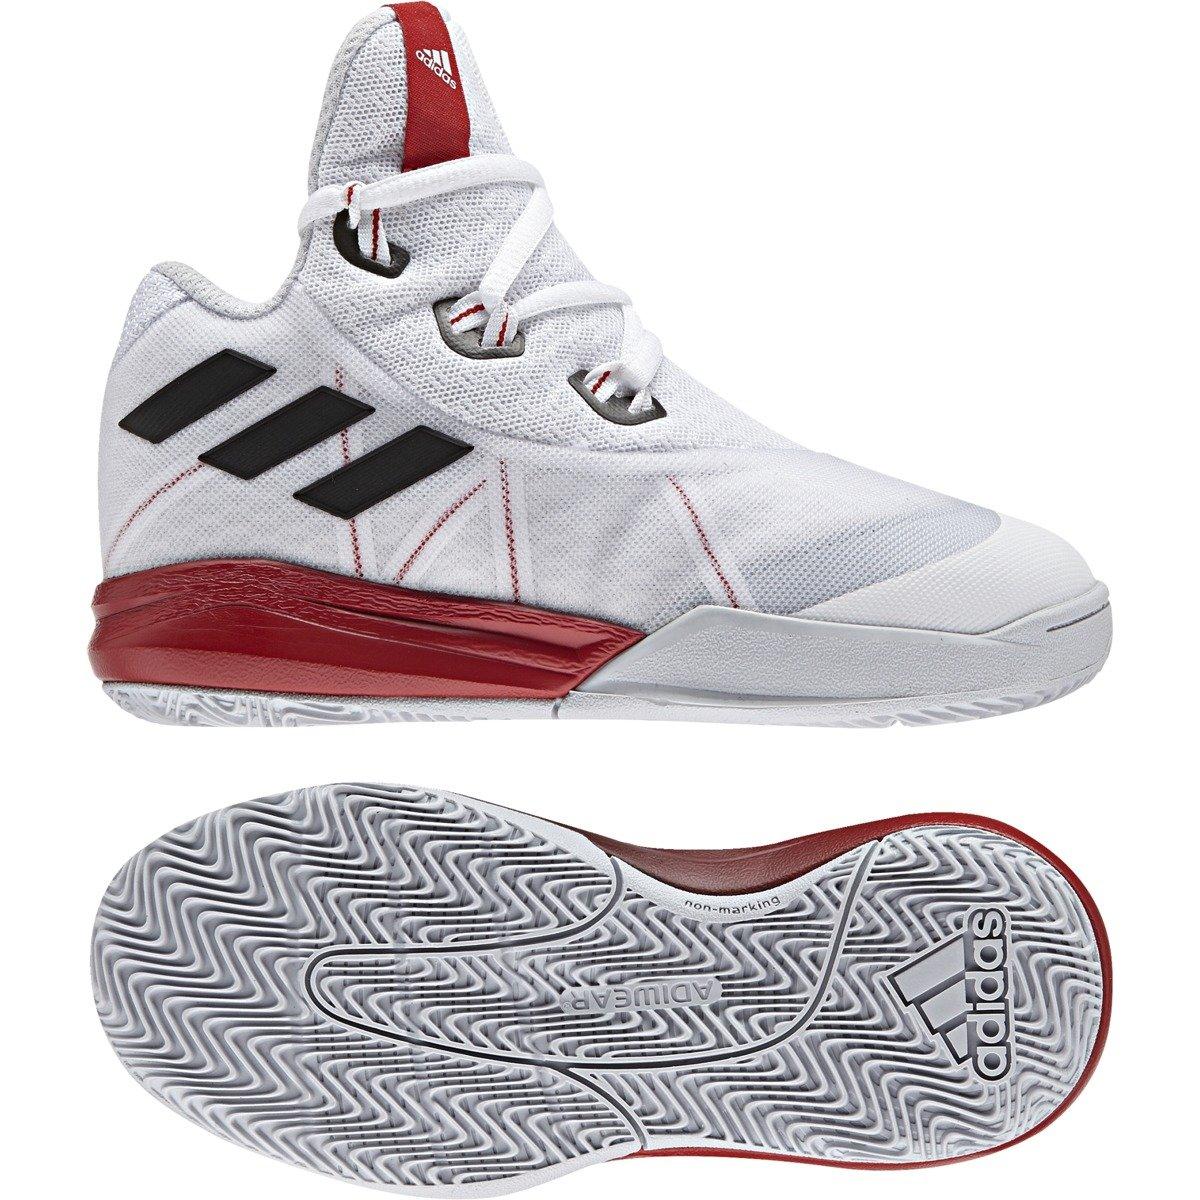 Chaussures Unrz4q5 Bw0527 Adidas Bounce Anus Energy Bb sylog xrBdoeCW